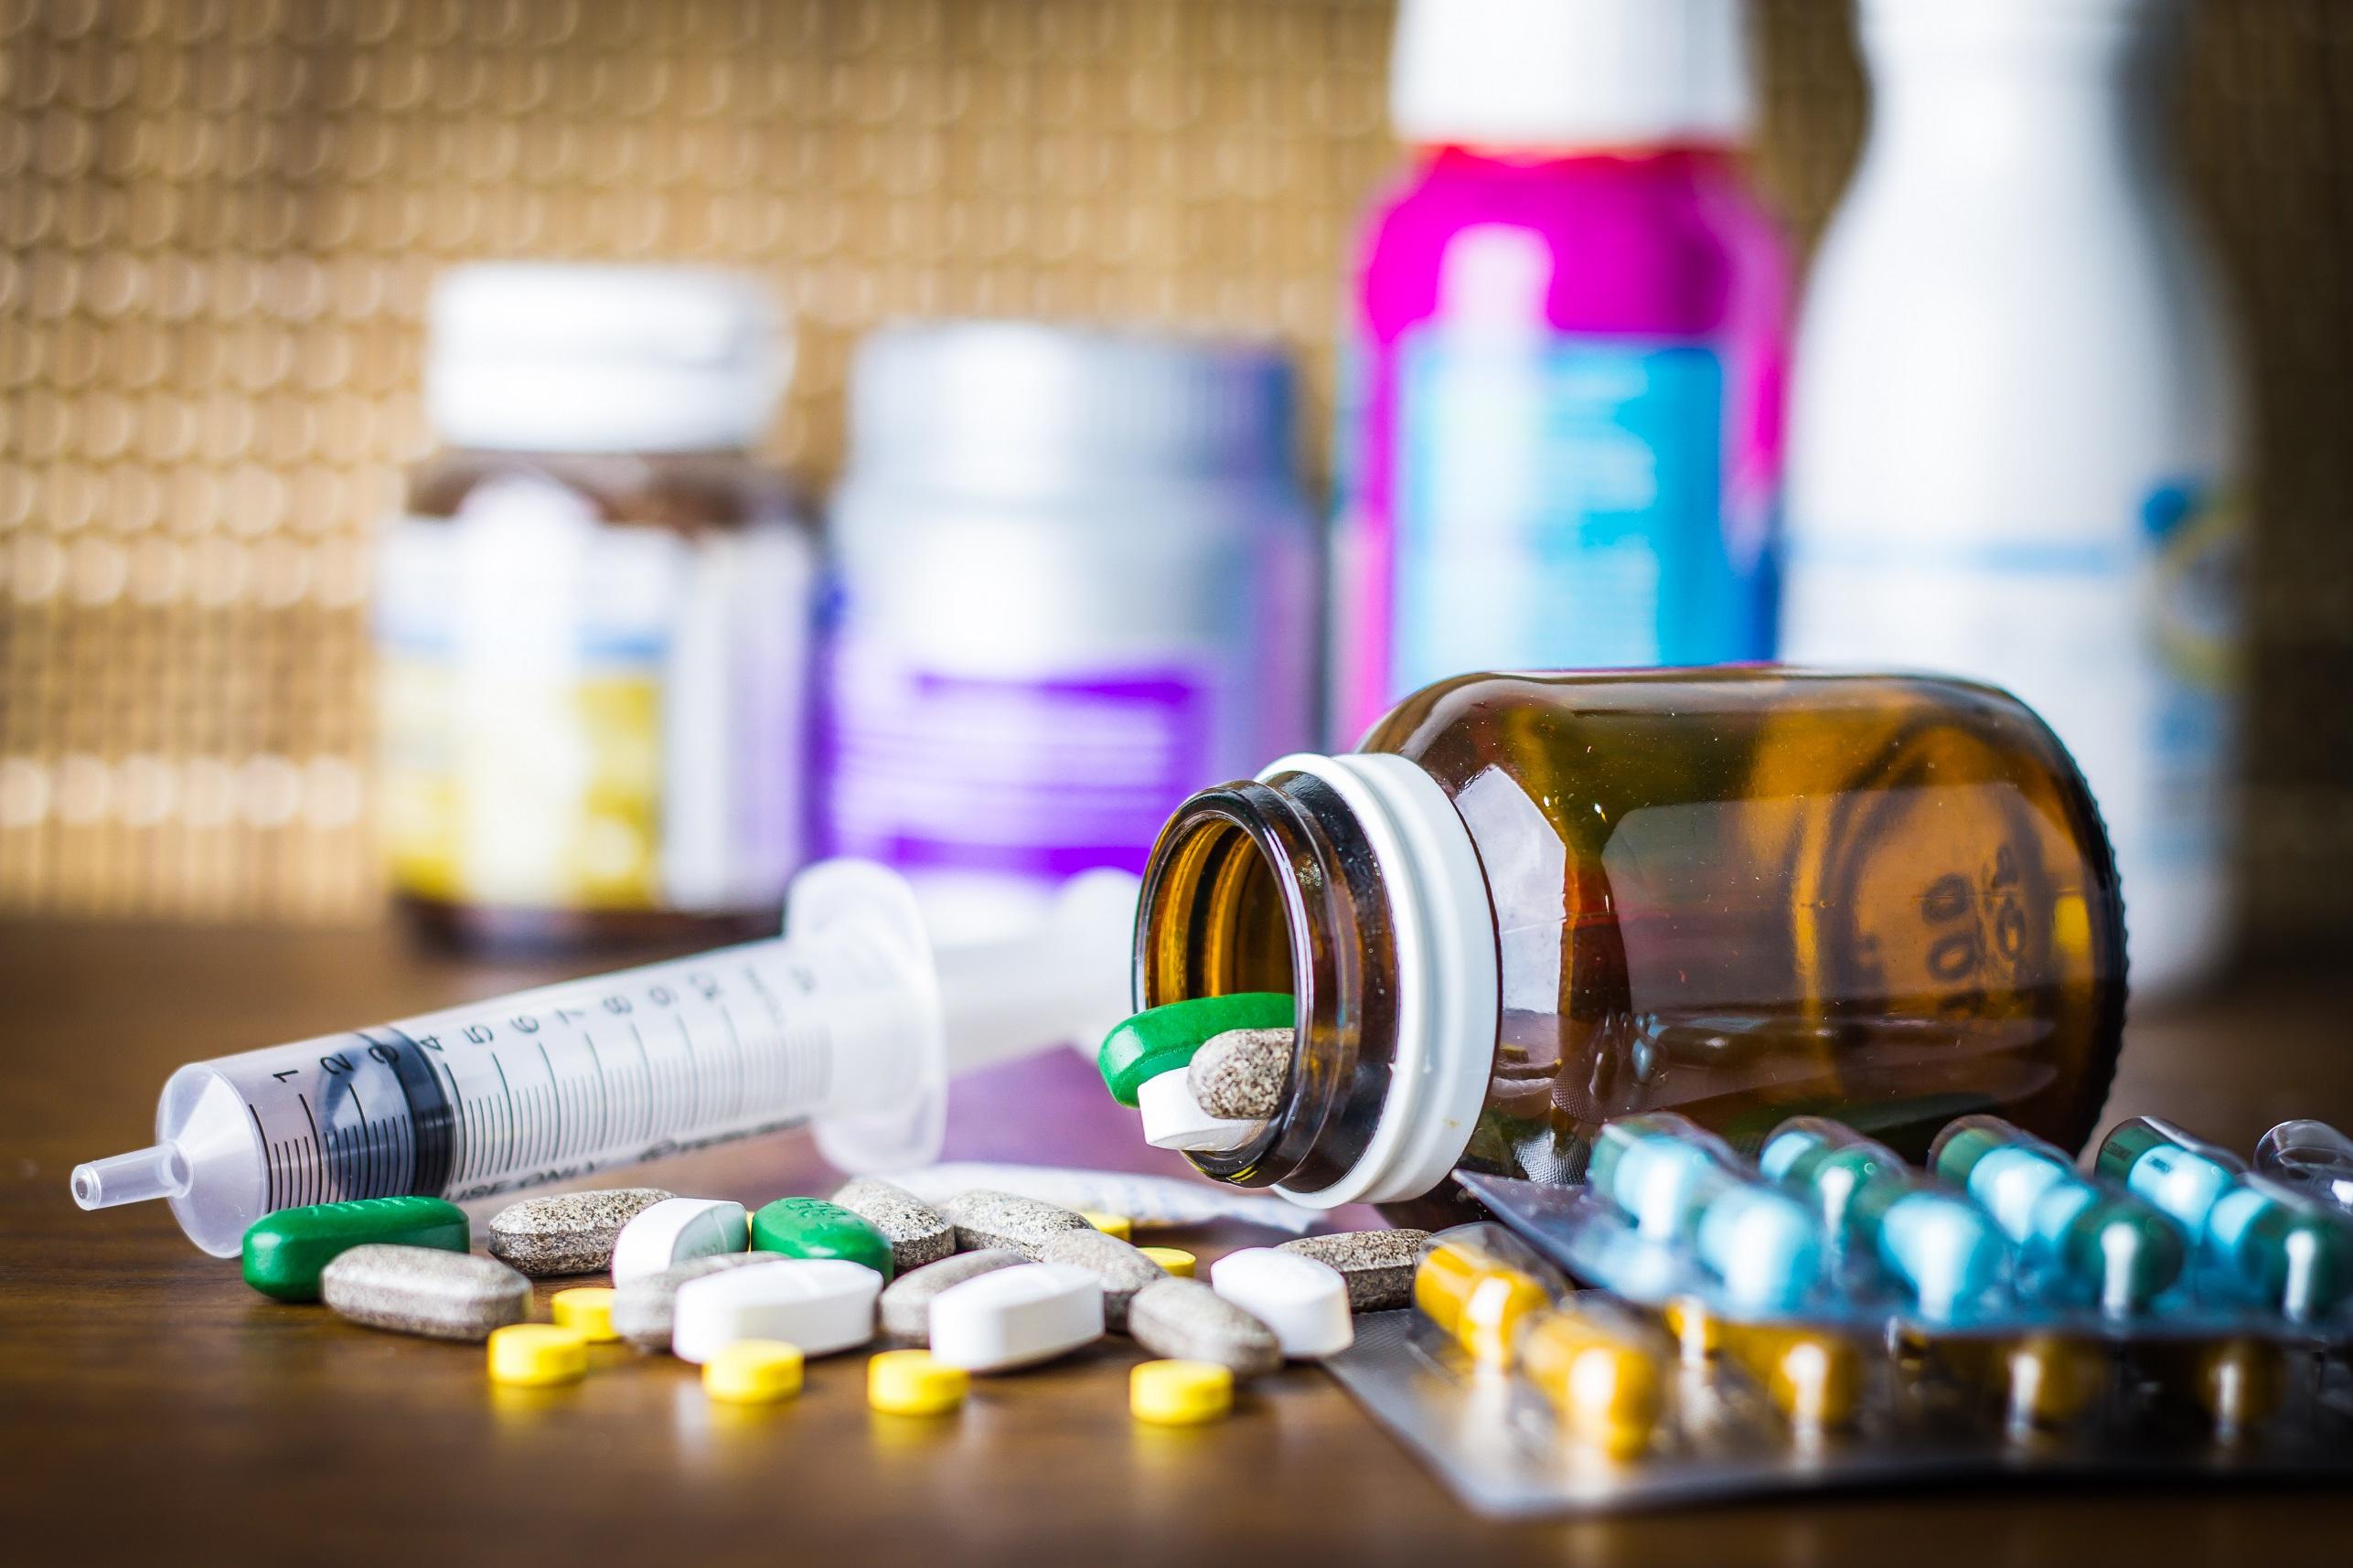 【AGA治療薬・ED治療薬など】個人輸入の医薬品にご用心。医師処方の薬と同じ名前でも、効果・安全性が異なります!